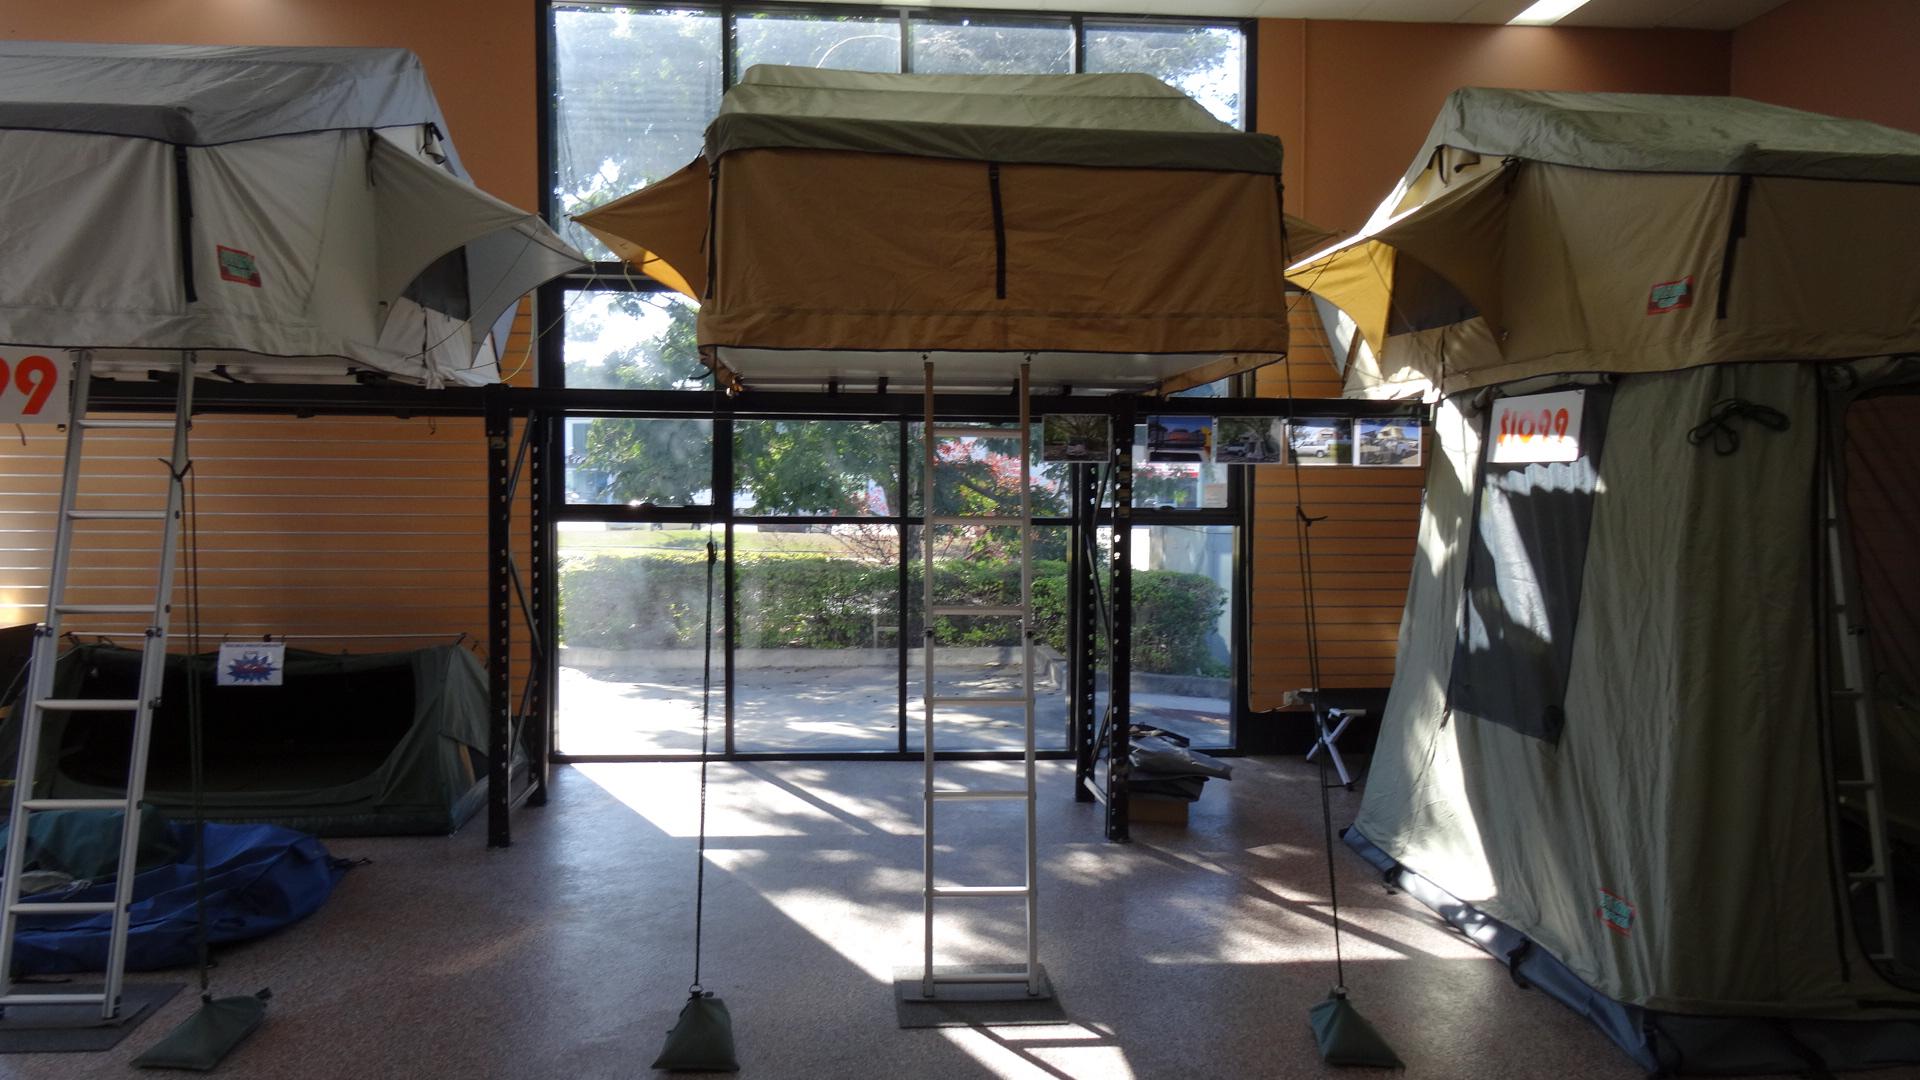 Roof top tent 1.8 Superior showroom & SUPERIOR Roof Top Tent 1.8m - Camper Trailers u0026 Rooftop Tents